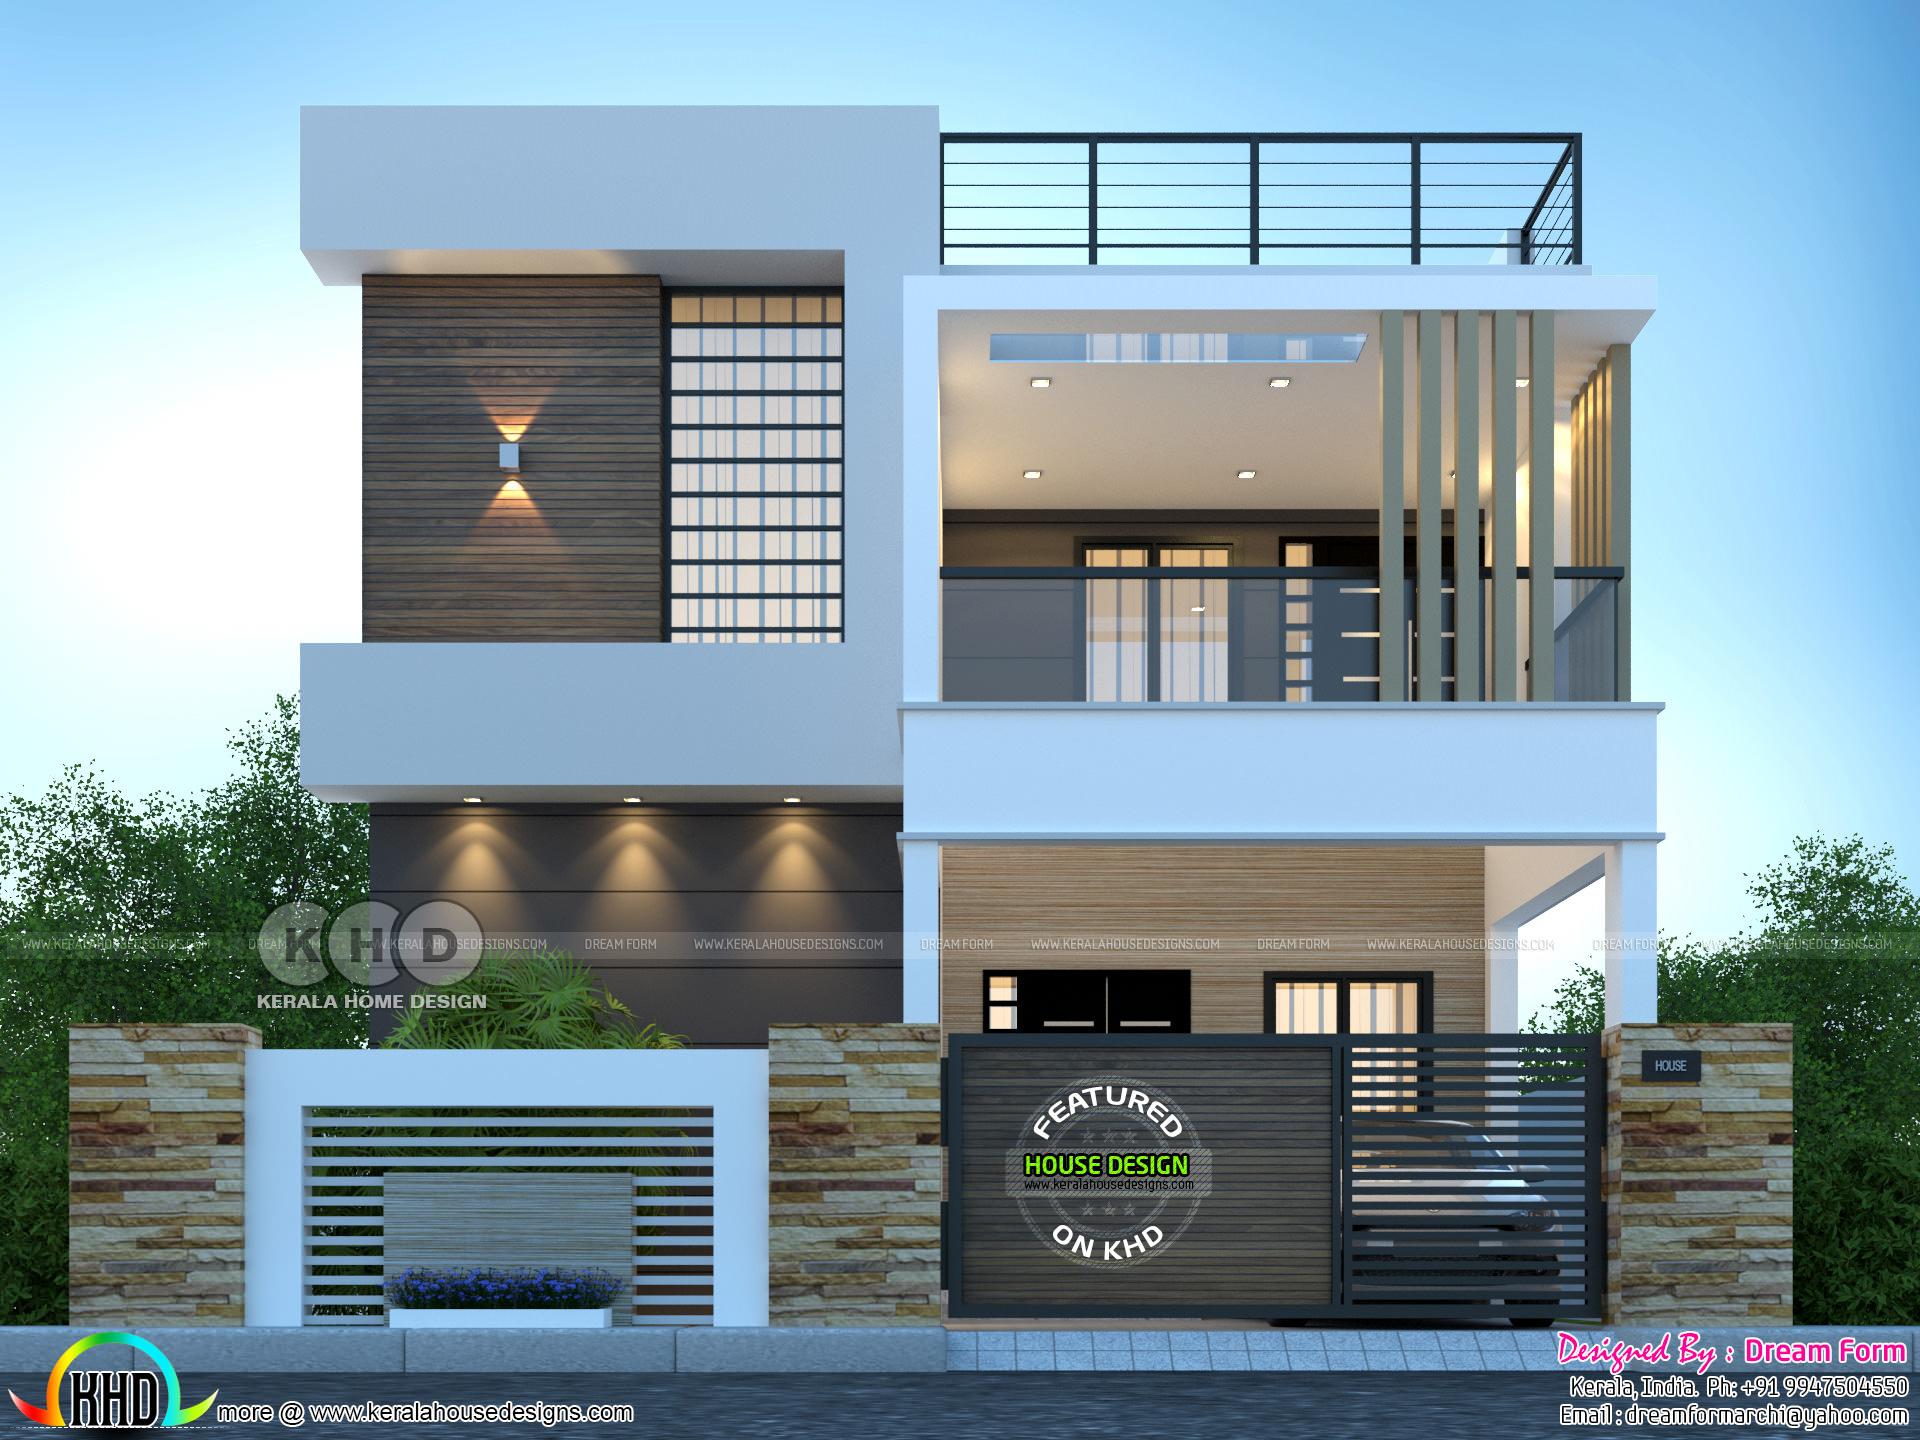 4 Bedrooms 2250 Sq Ft Modern Home Design Kerala Home Design And Floor Plans 8000 Houses